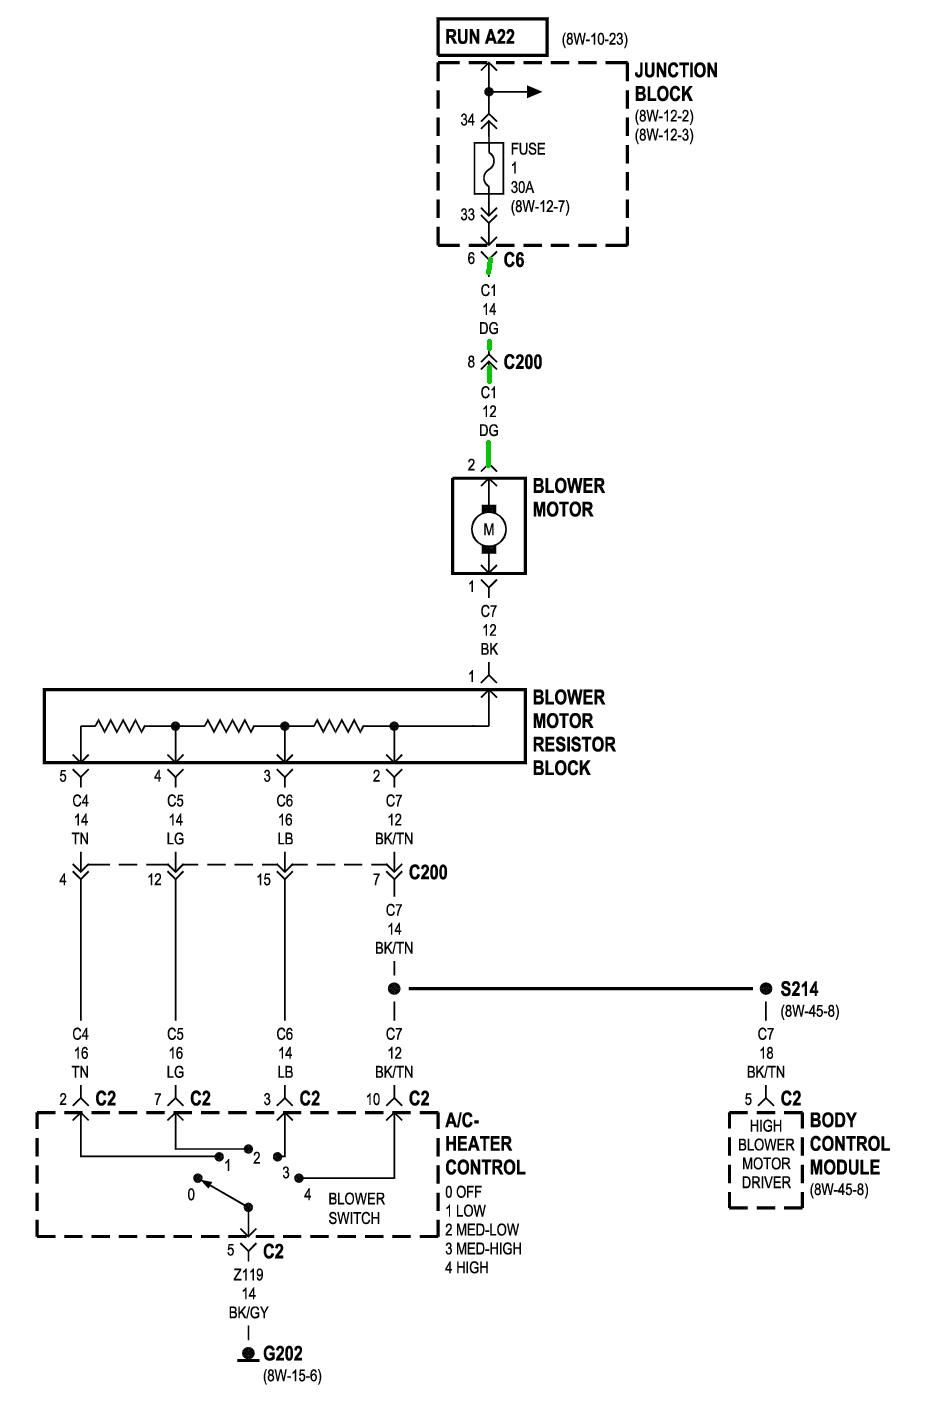 2005 chrysler sebring fuse box diagram lmFtQhg?resize\\\\\\\=665%2C1013 2004 chrysler sebring fuse box diagram wiring diagram simonand 2004 chrysler sebring wiring diagram at gsmx.co